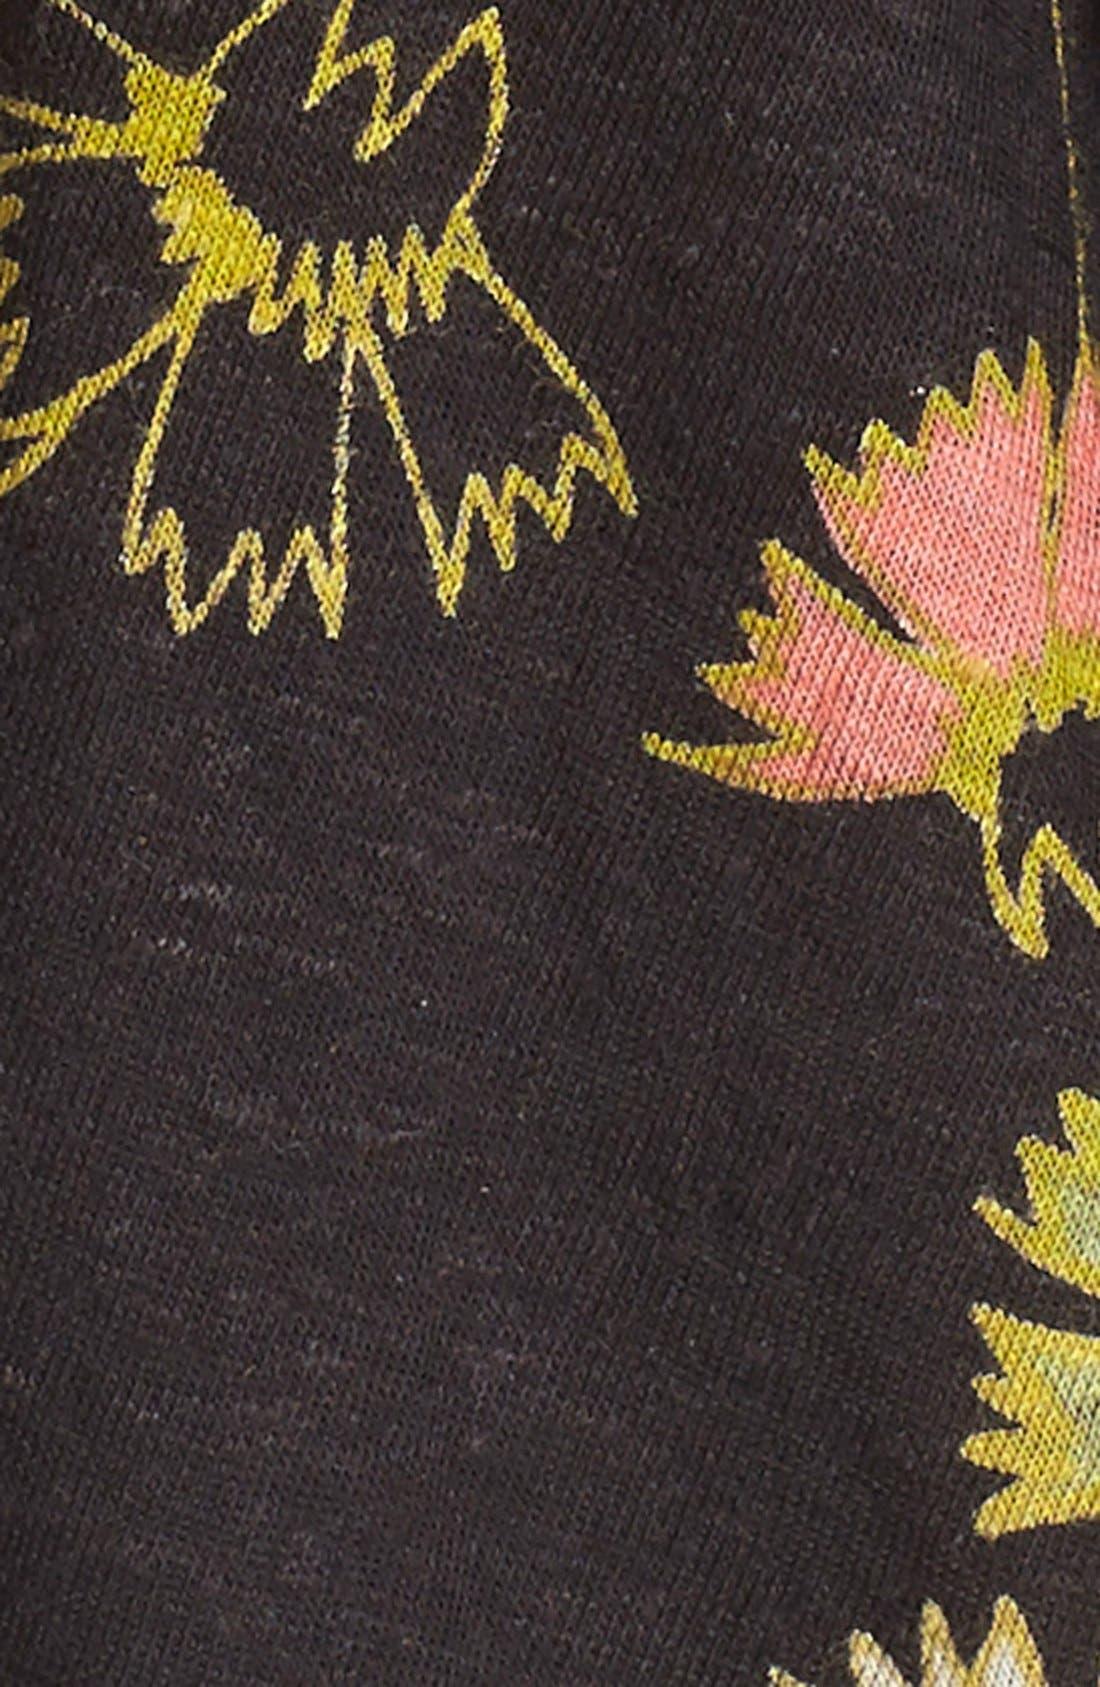 'Love Potion' Floral Print Sleeveless Knit Top,                             Alternate thumbnail 2, color,                             001